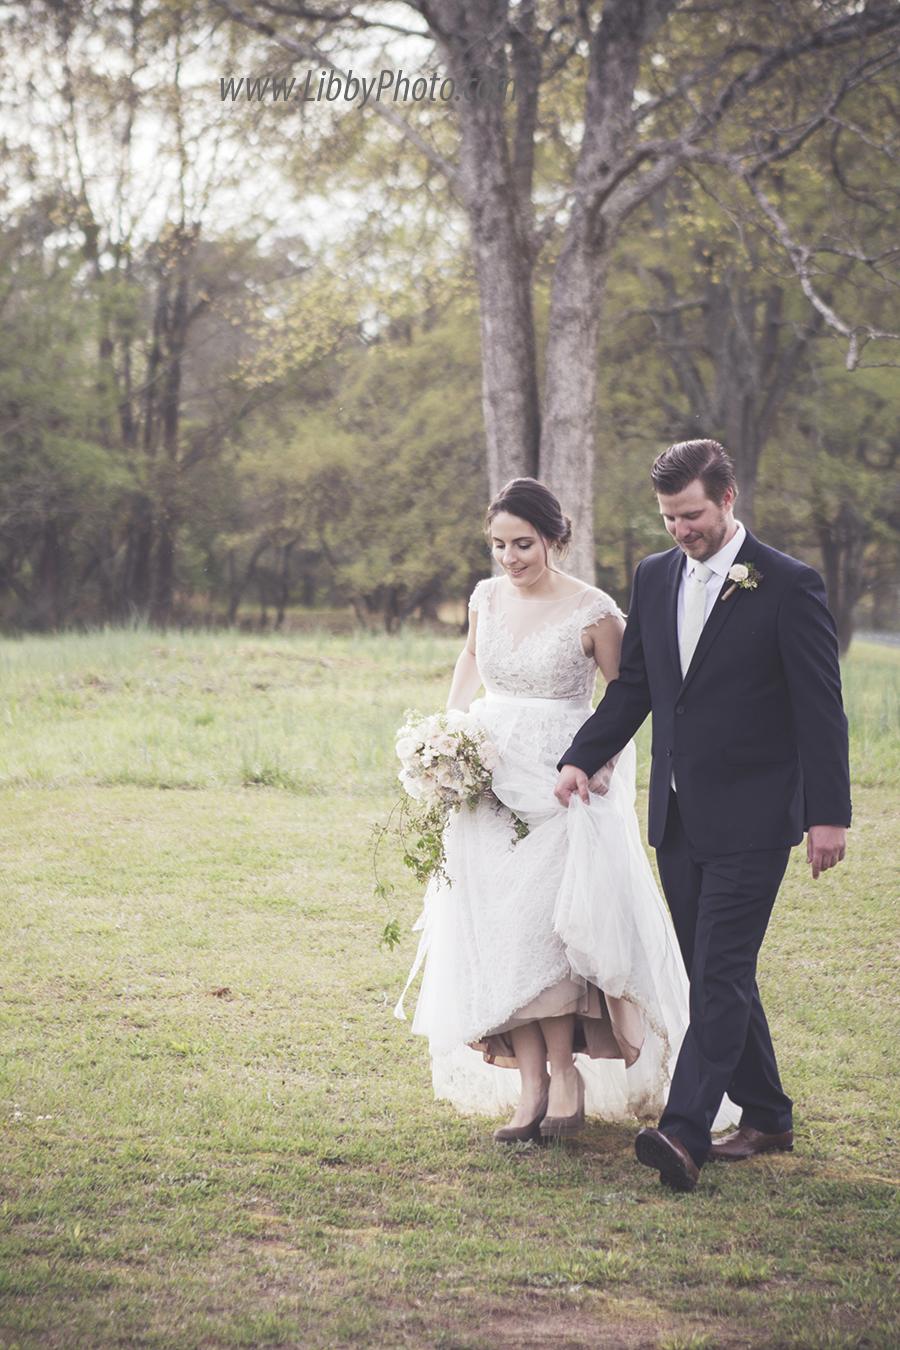 Atlanta wedding photography Libbyphoto (32).jpg